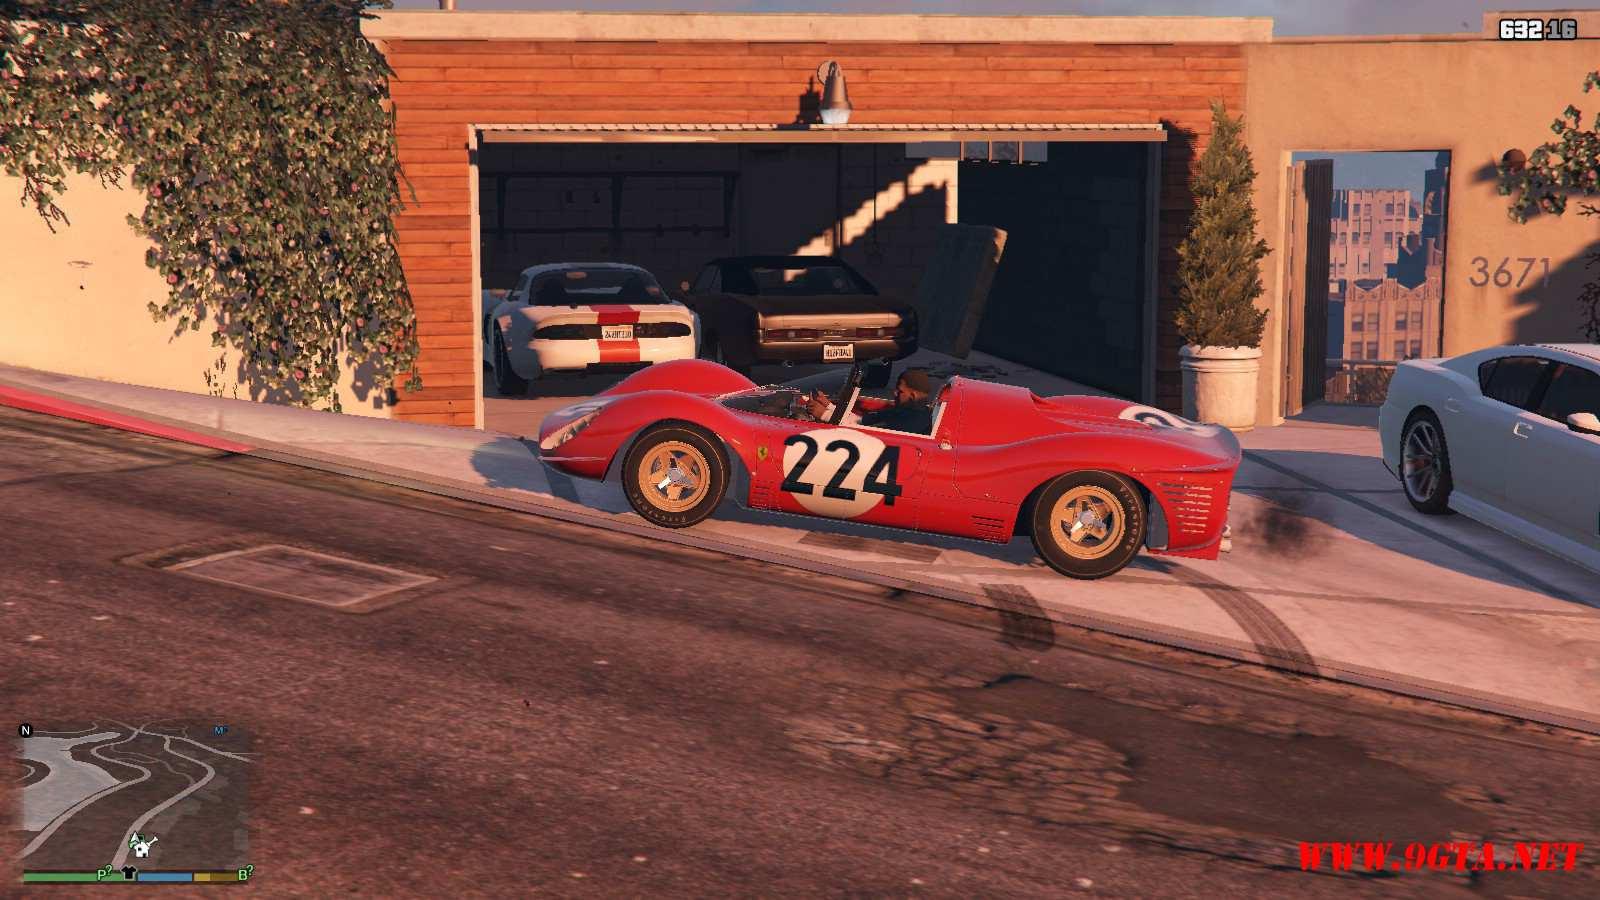 1967 Ferrari 330 P4 GTA5 Mods (22)